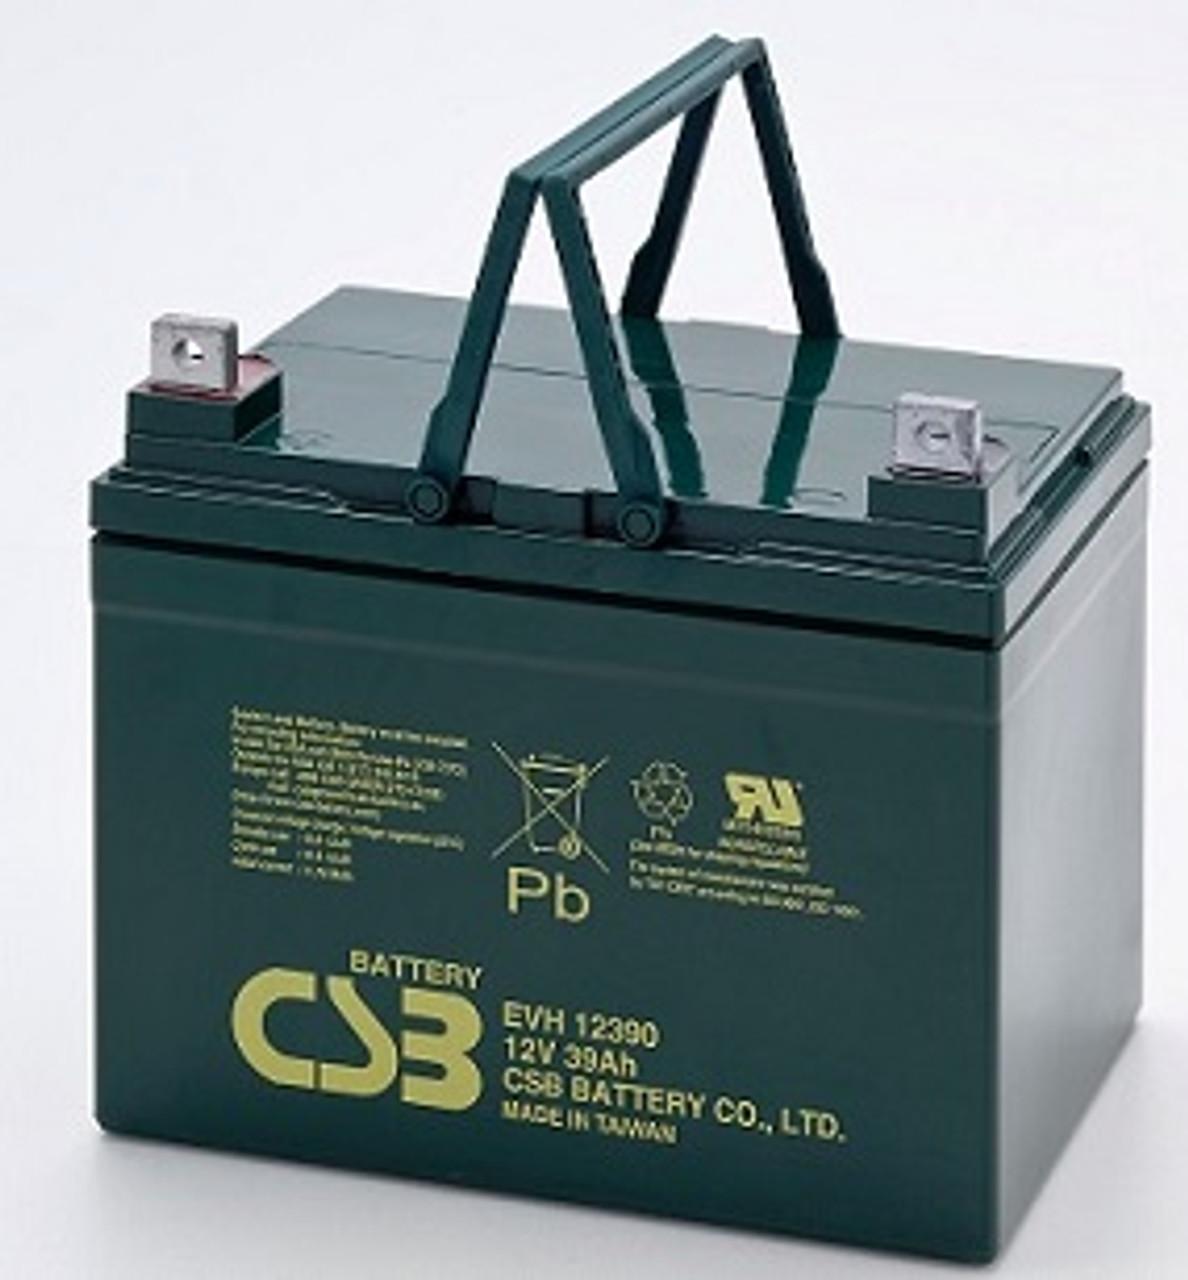 CSB EVH12390 12V 39Ah Battery SLA Sealed Lead Acid